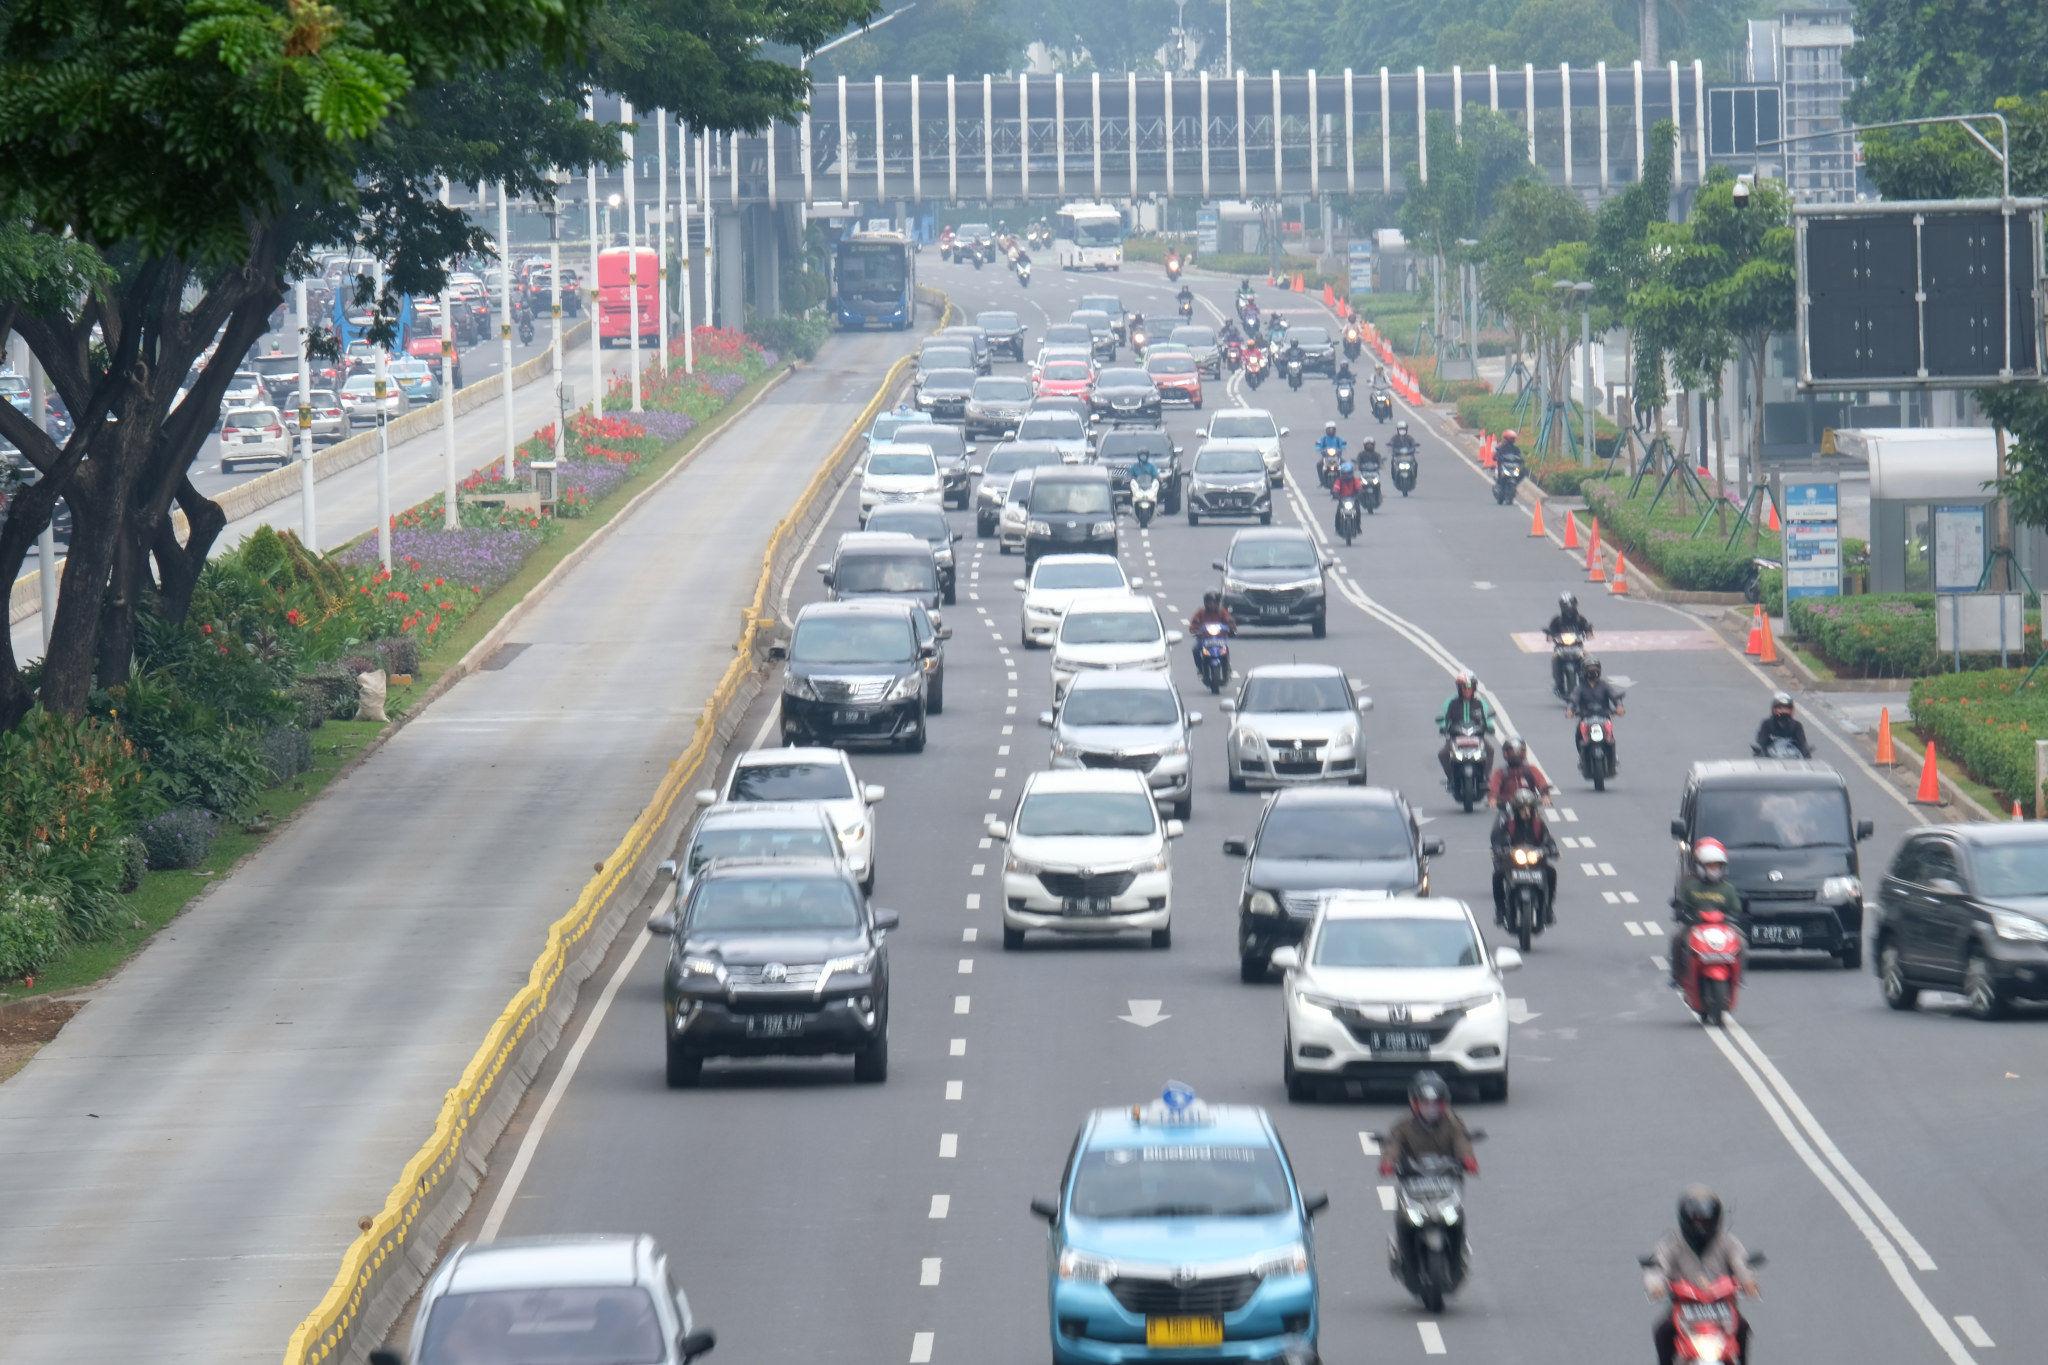 Staf Anies Tuding Pembangunan Jakarta Era Ahok, Jokowi, dan Foke Terlalu Utamakan Mobil Pribadi